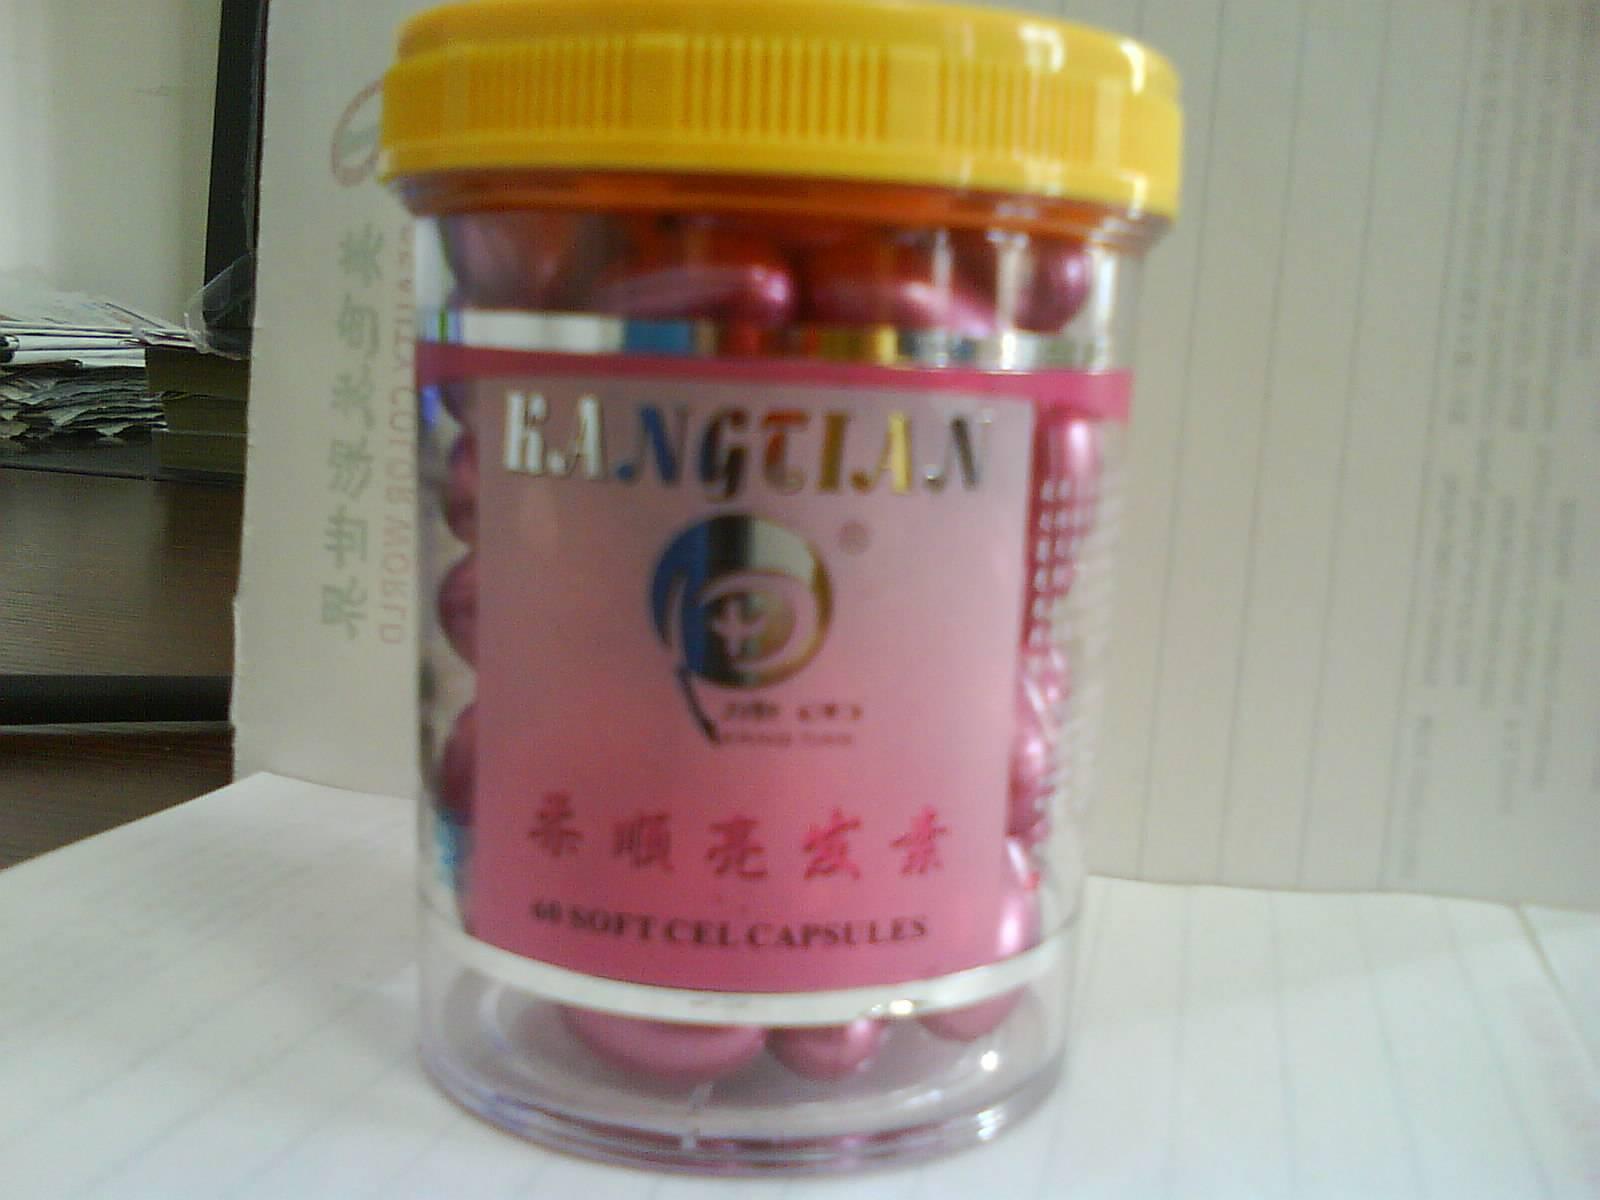 Kangtian Soft Cel Capsules